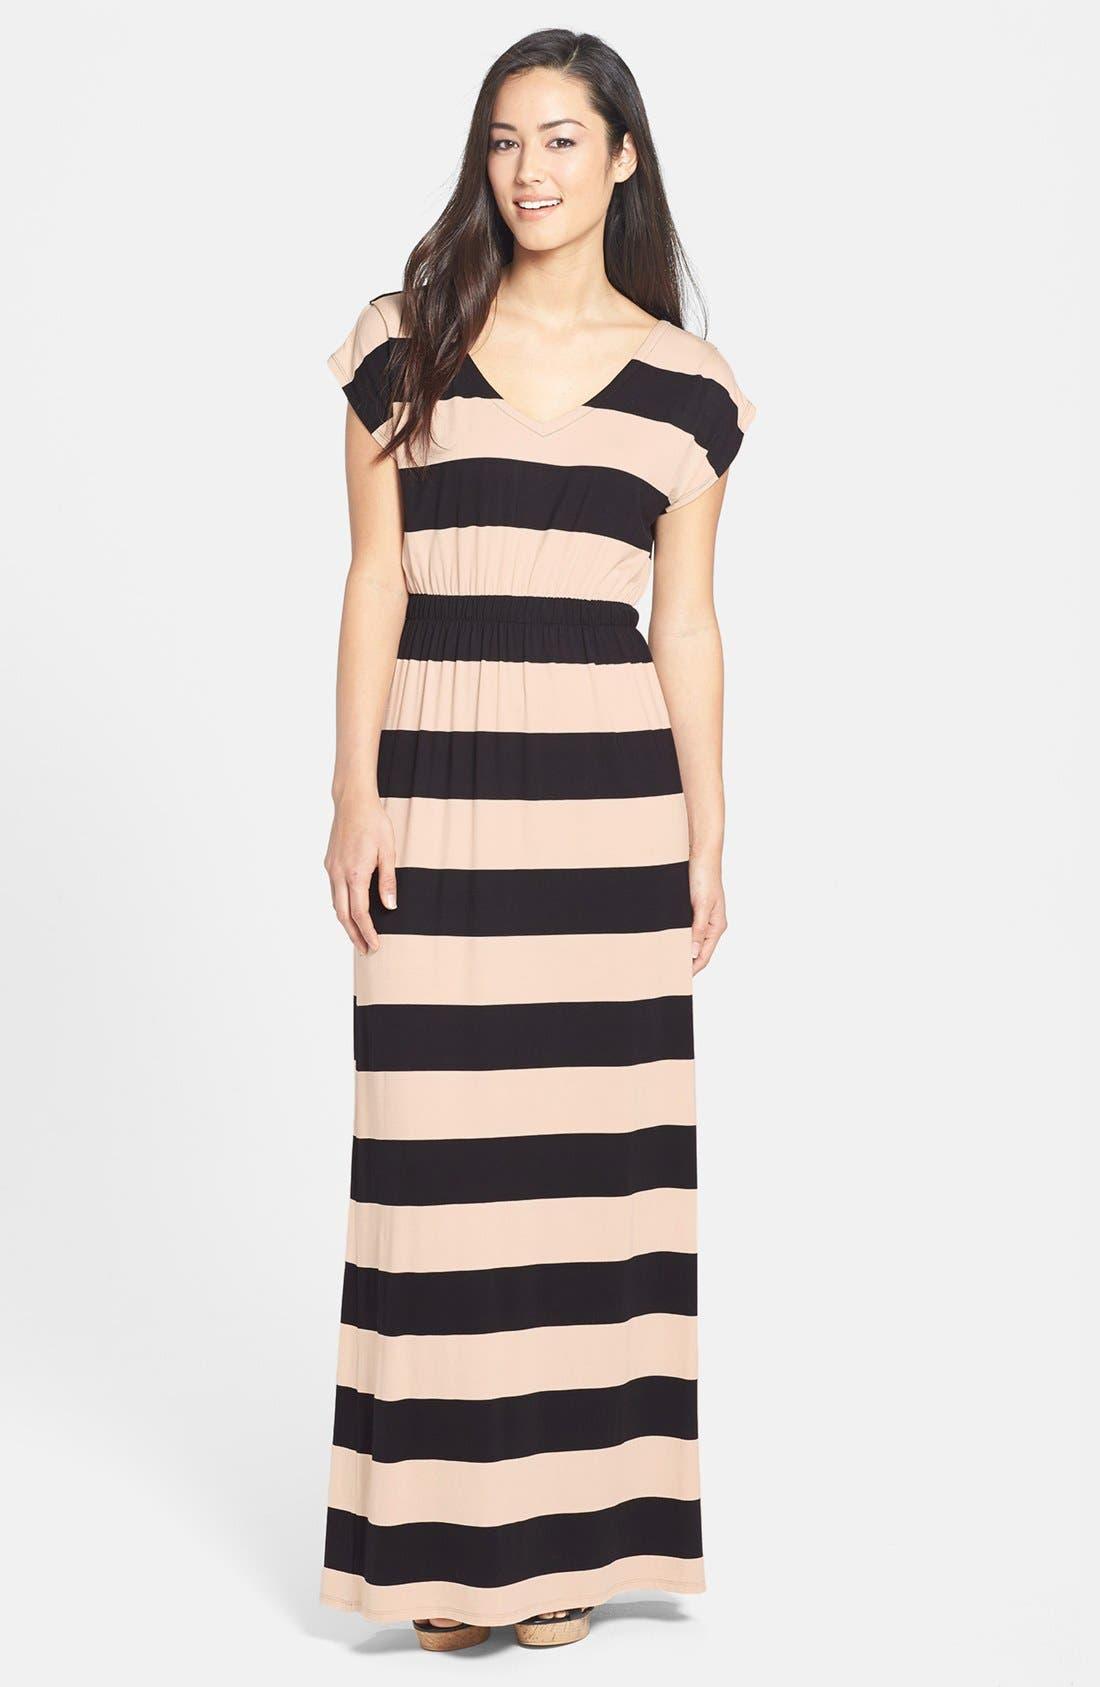 Alternate Image 1 Selected - Felicity & Coco Blouson Stripe Maxi Dress (Nordstrom Exclusive)